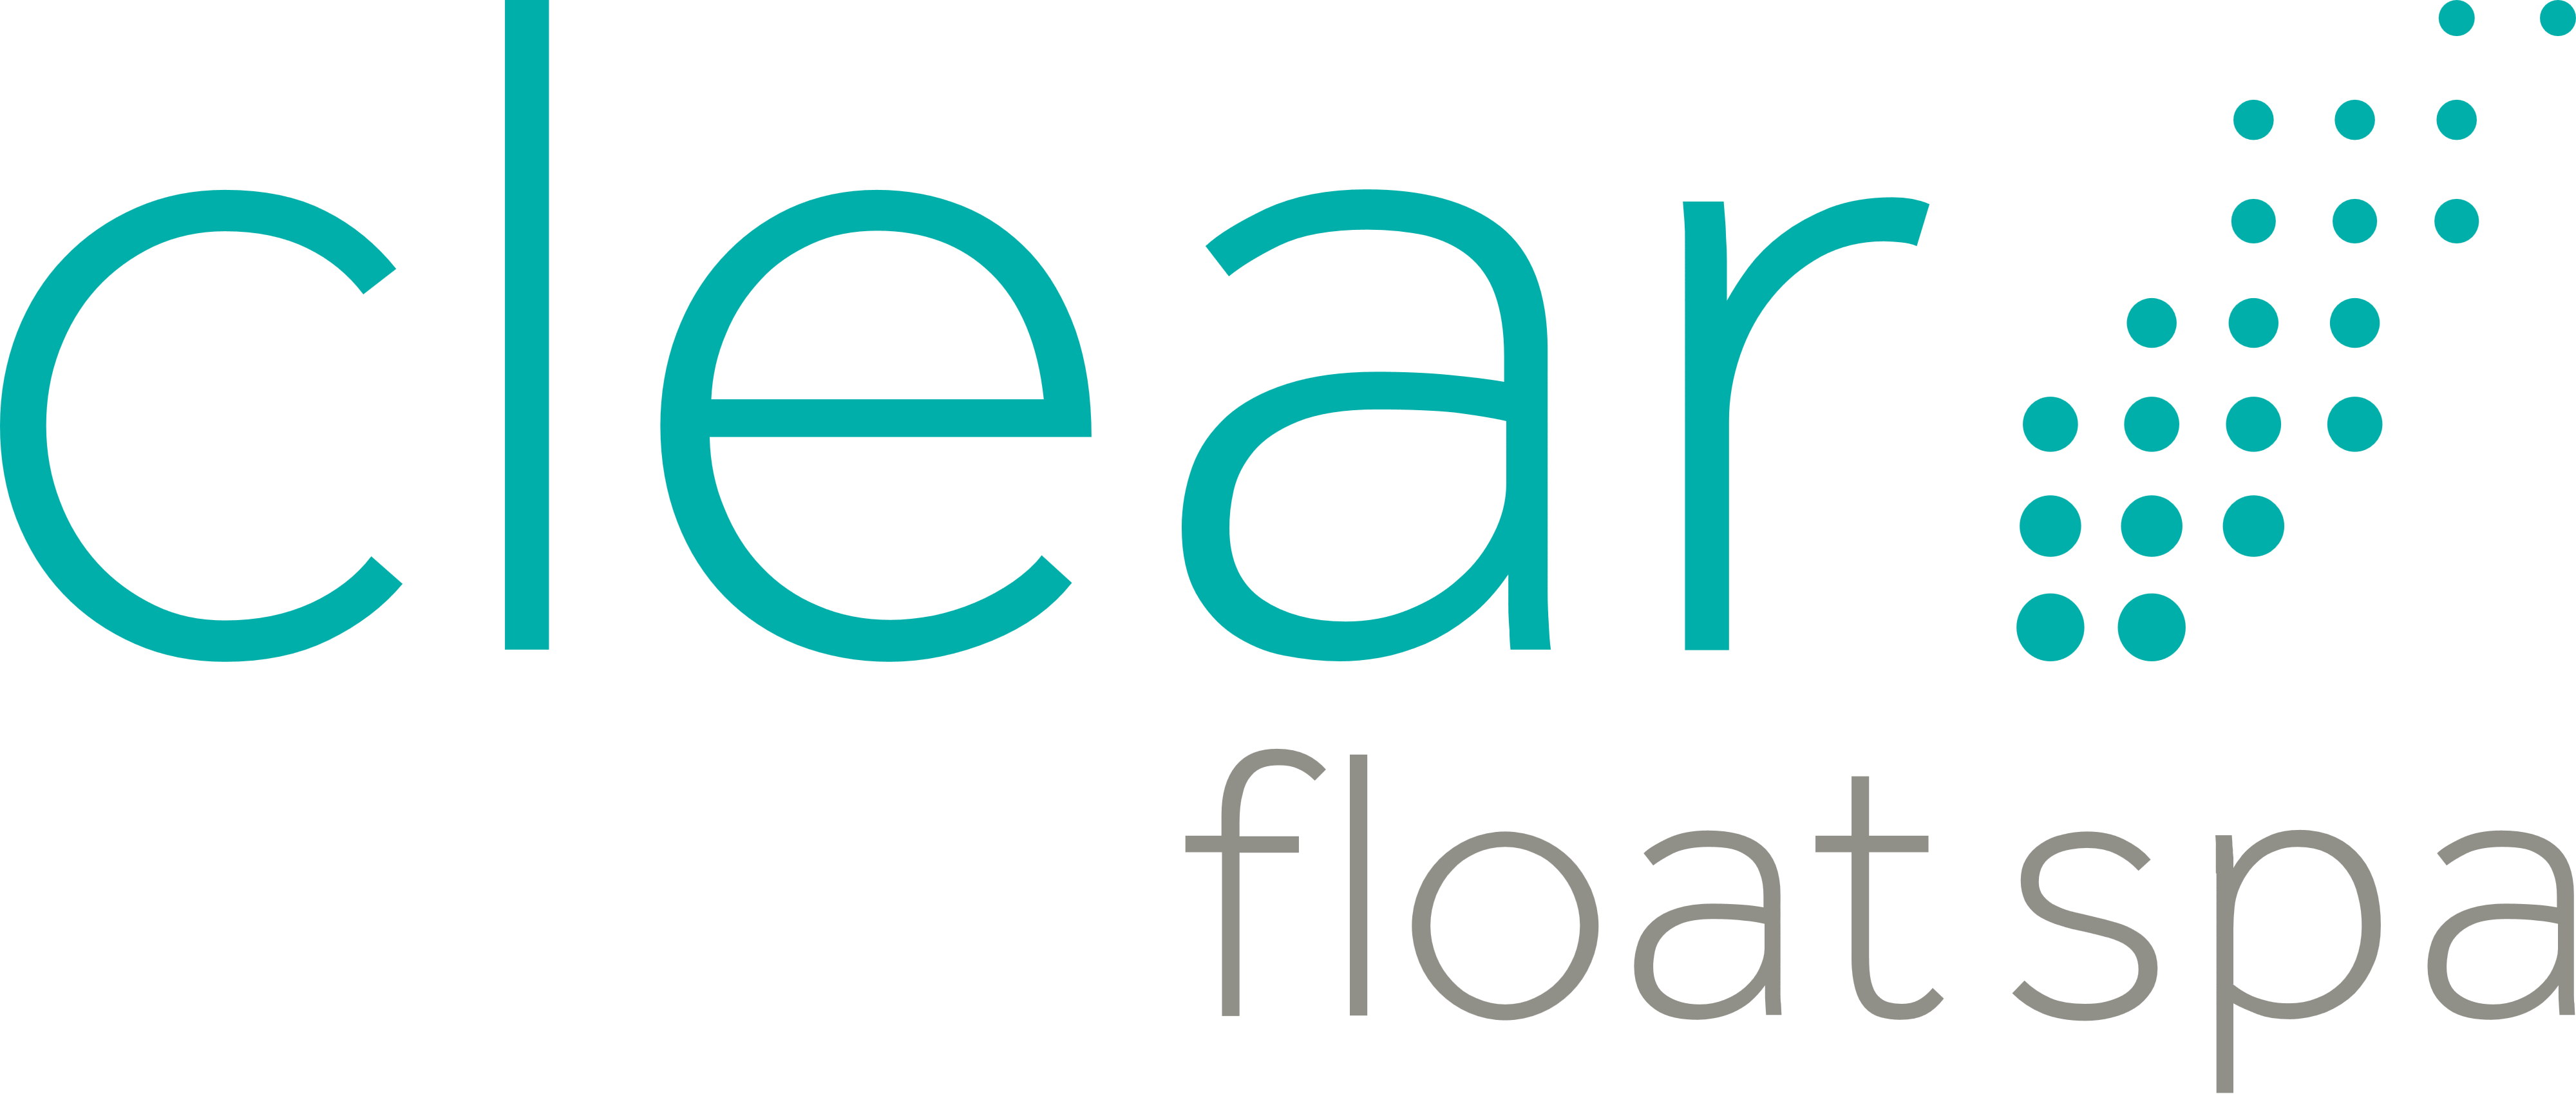 Clear Float Spa u2013 Logos Download